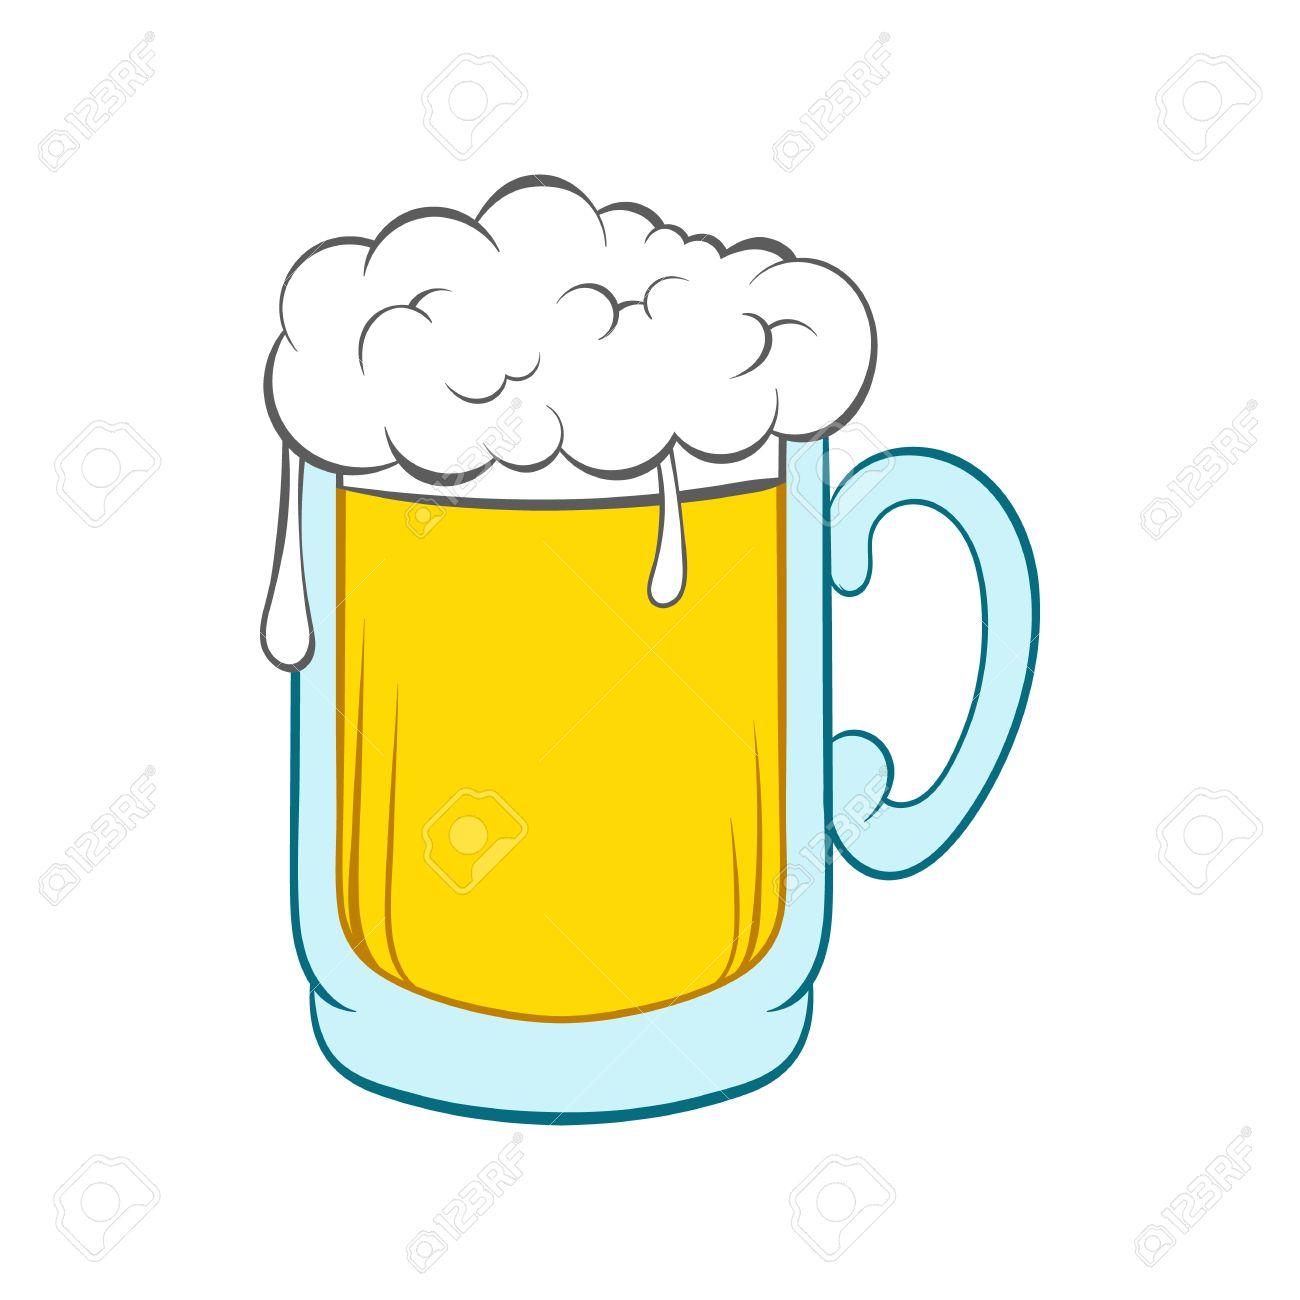 beer mug icon in cartoon style on a white background royalty free rh 123rf com cartoon beer mugs cheers cartoon beer mug images